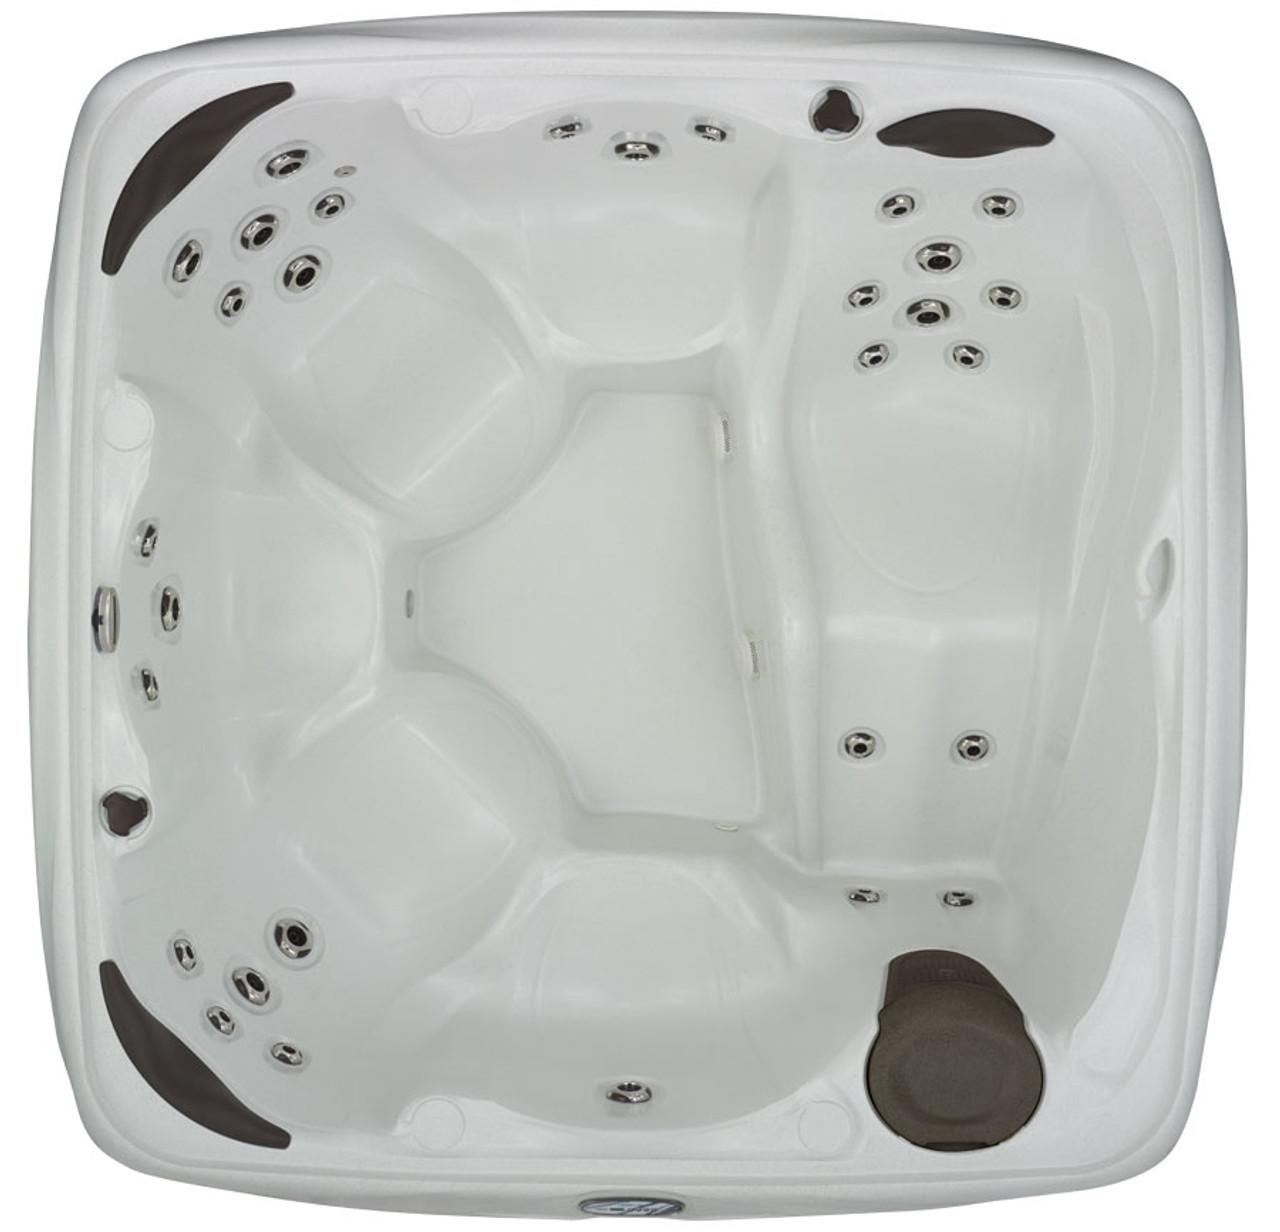 Crossover 740L – 2 Pump 5-6 Person Hot Tub